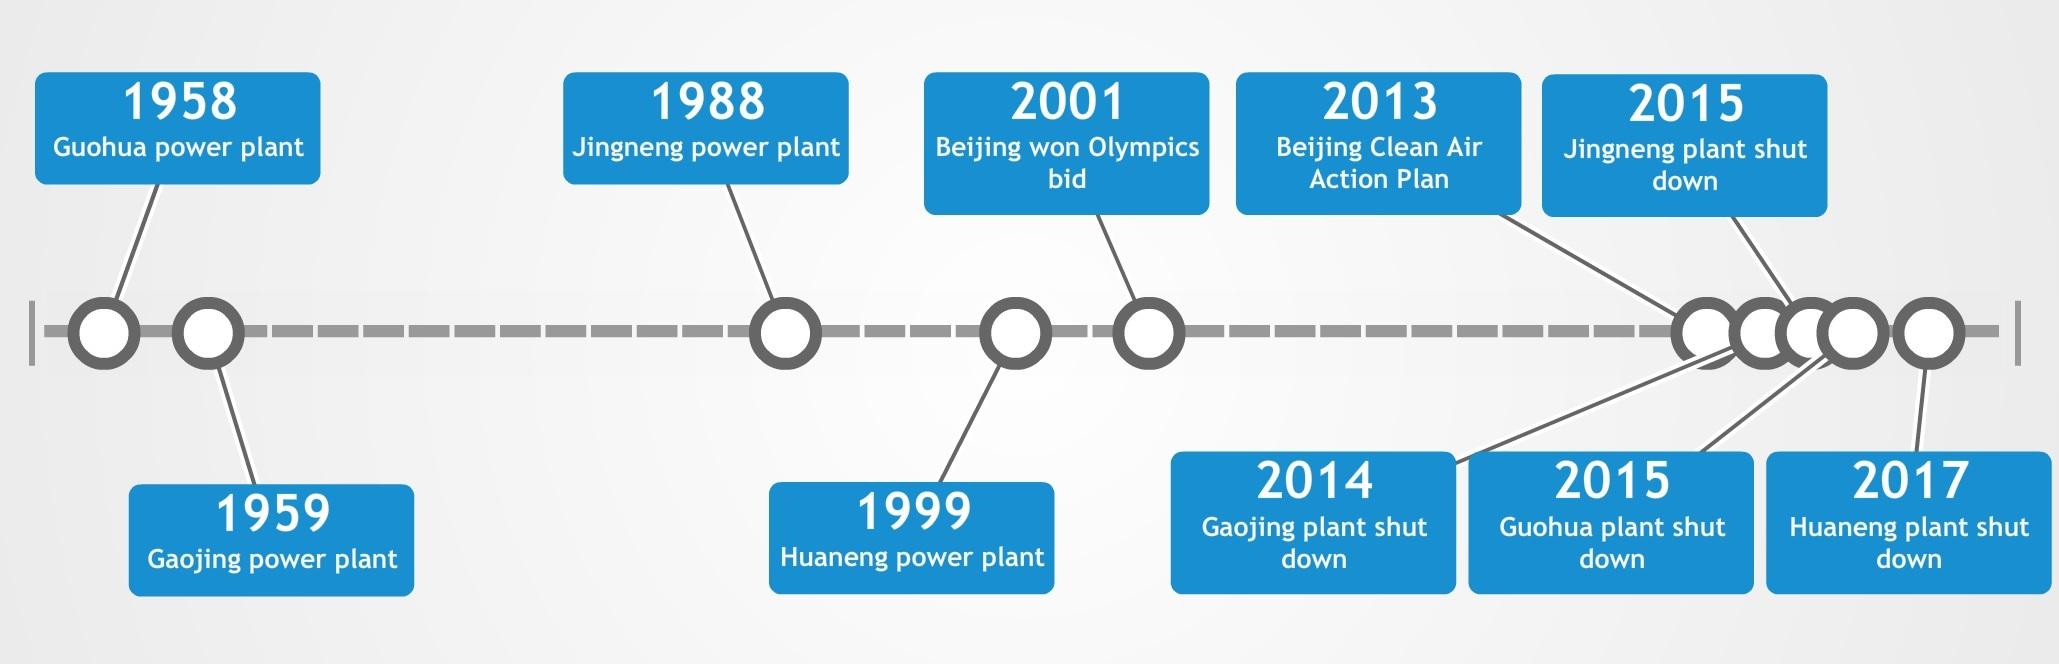 A timeline of Beijing's major coal power plant construction